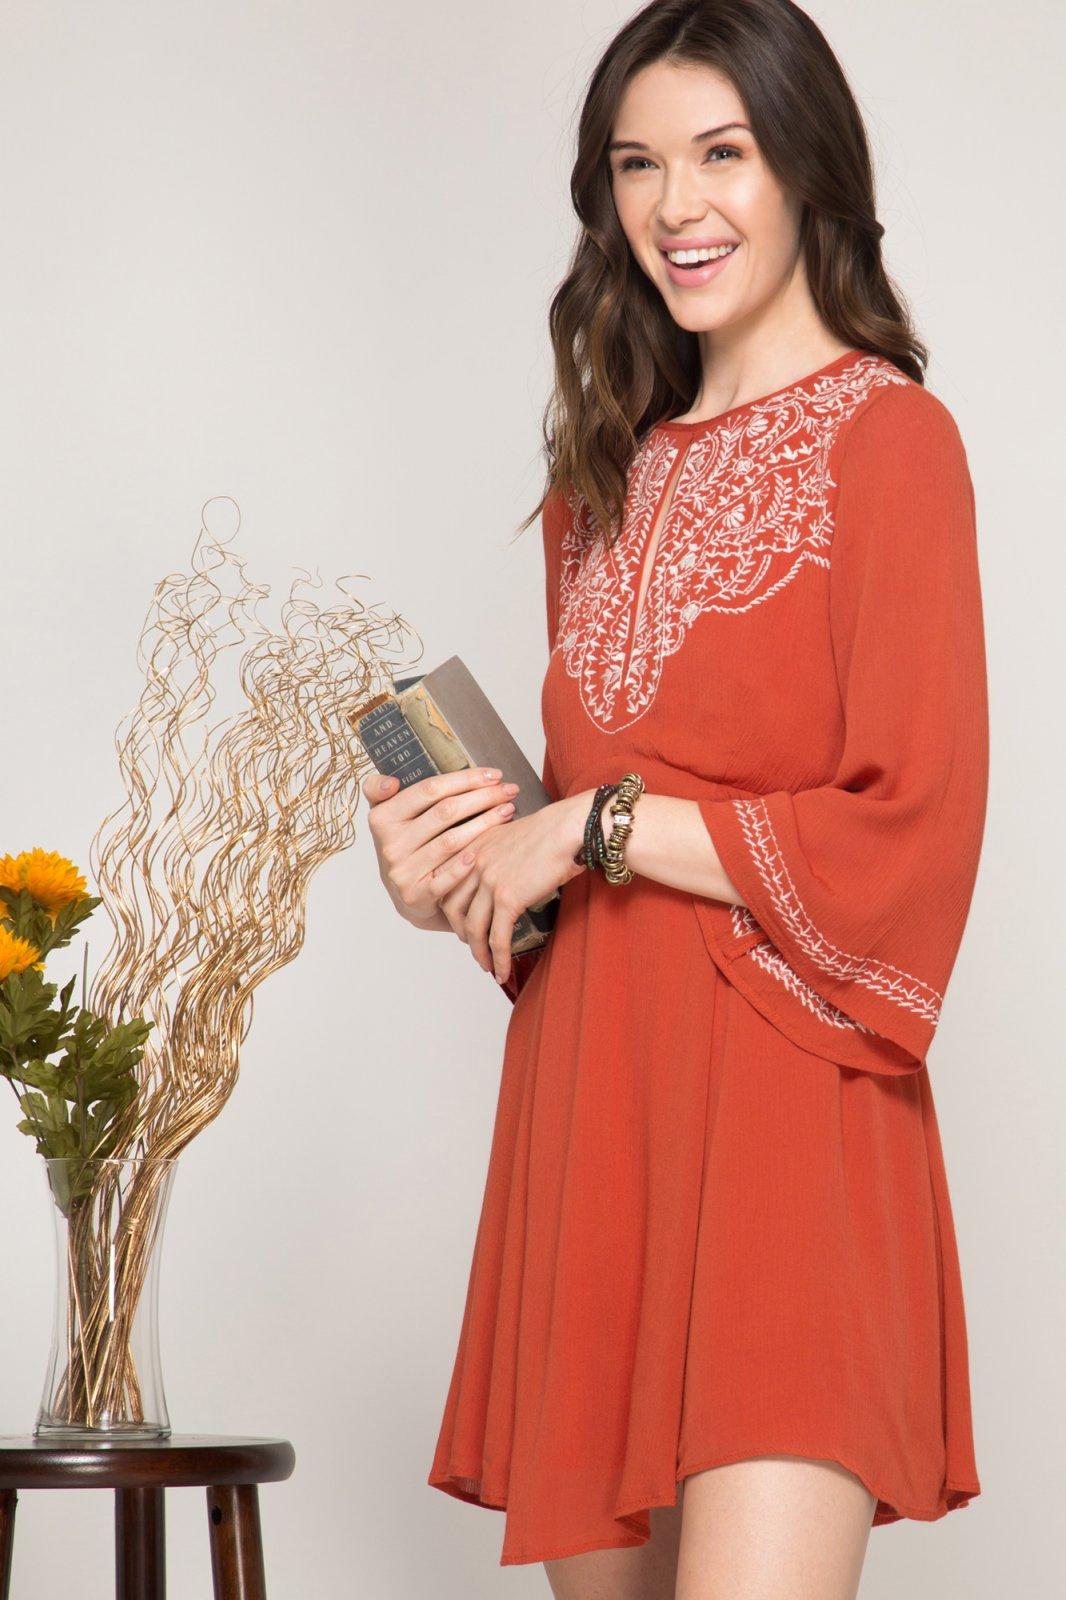 Dress  - Bohemian Embroidered *Jr / Miss / Adult Petite